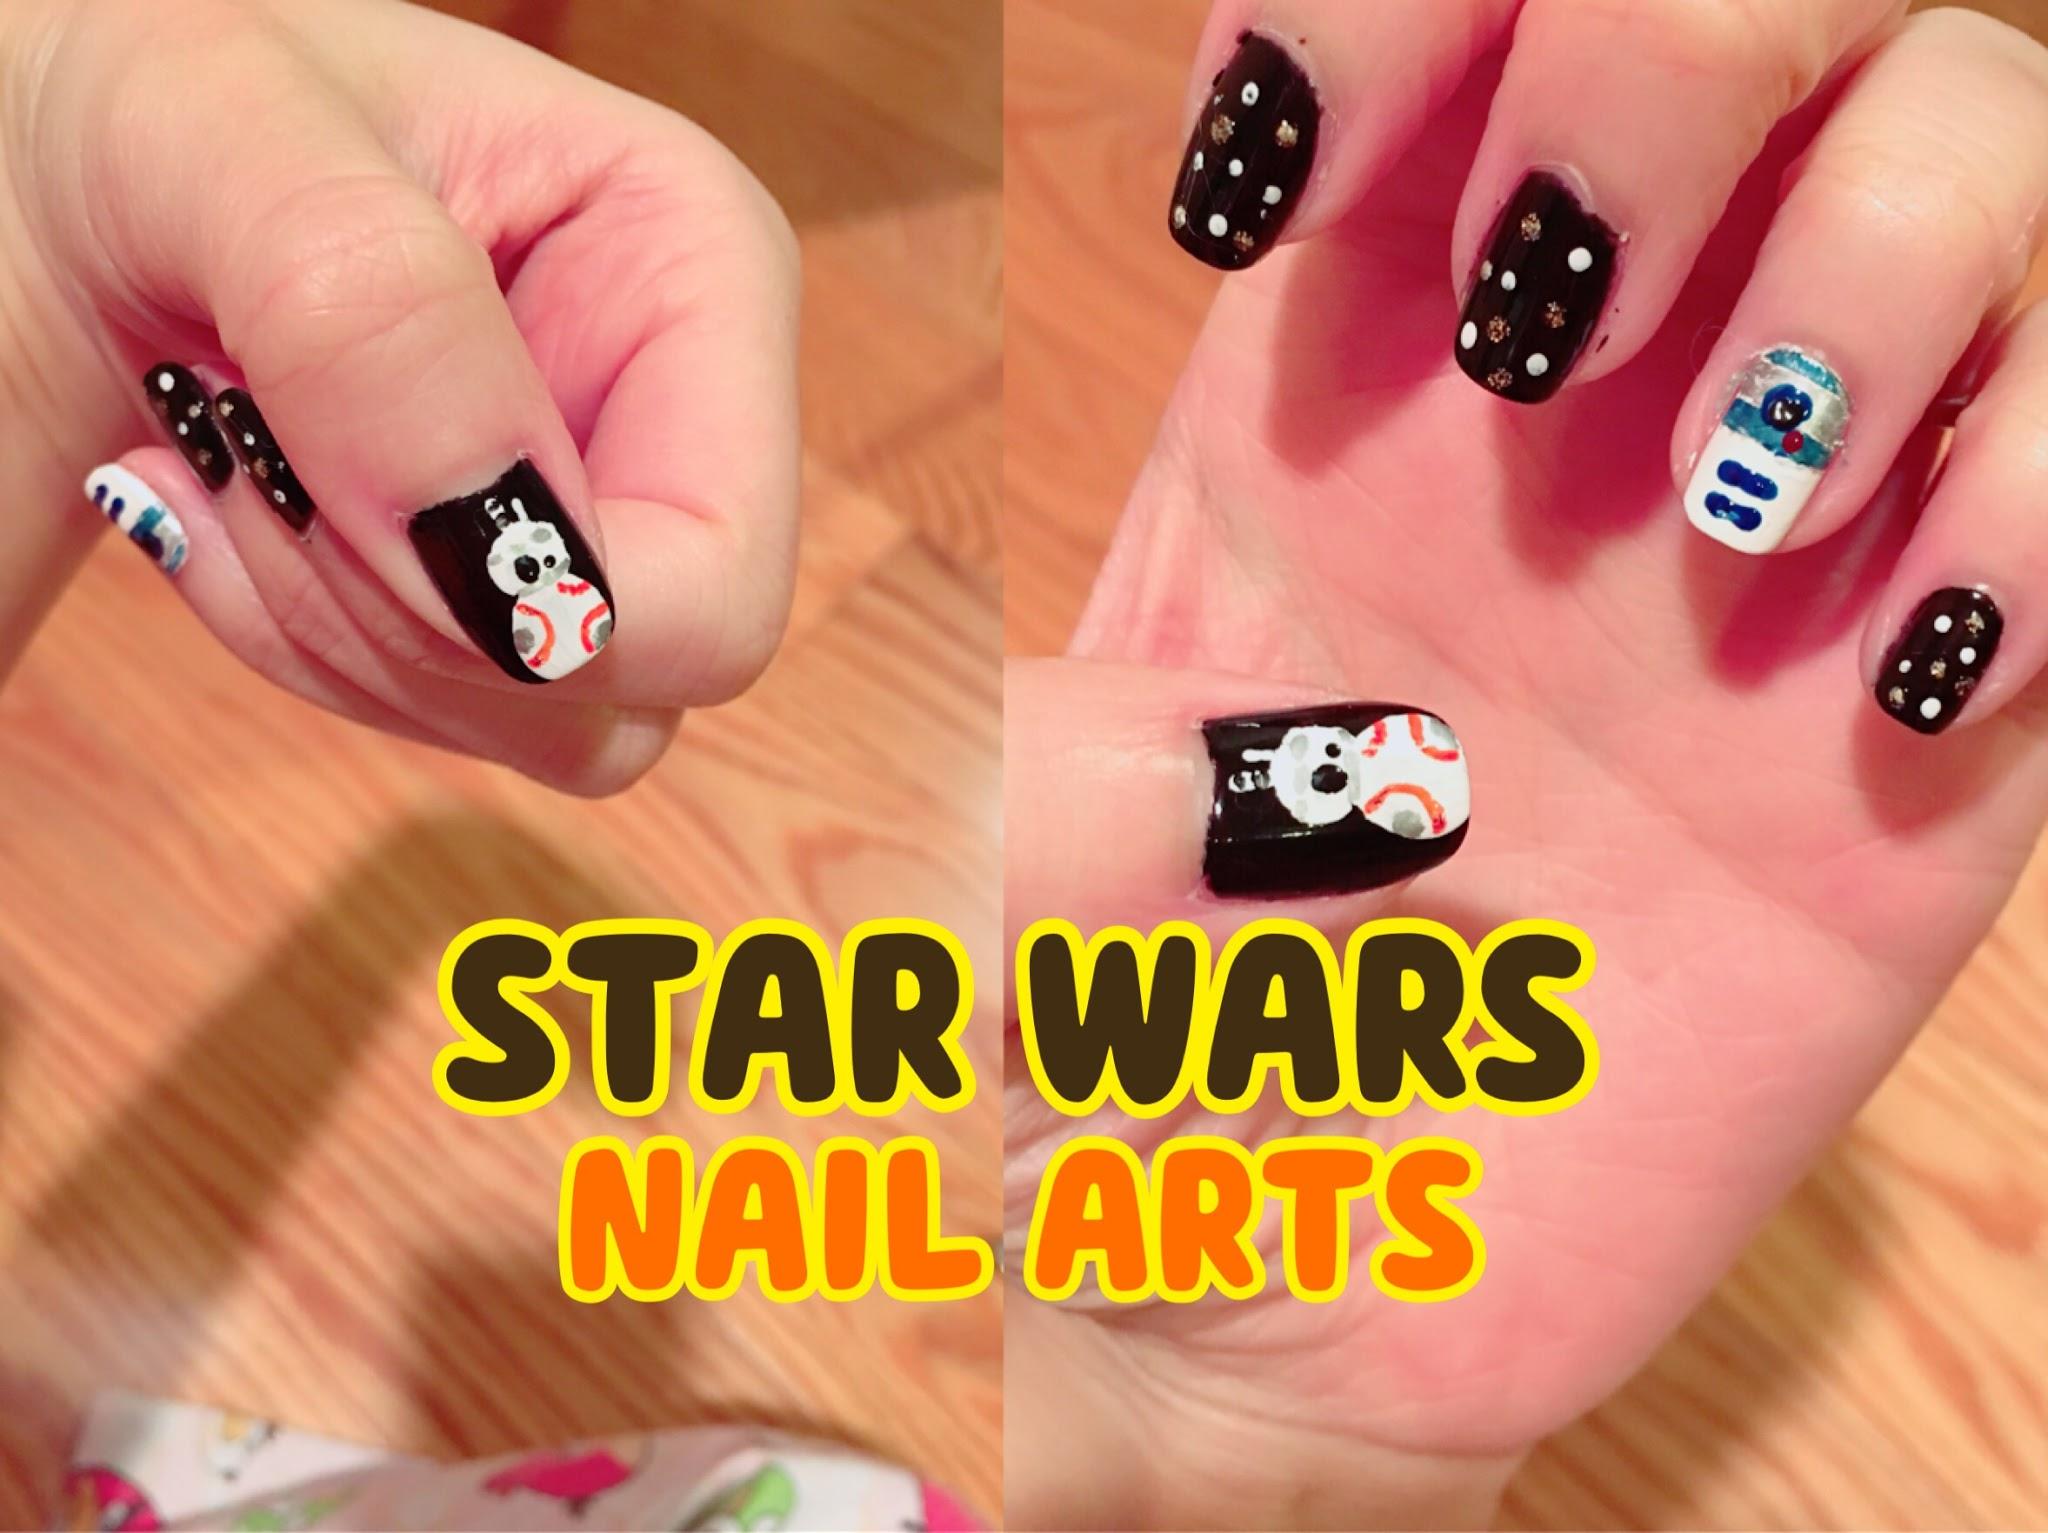 Mokolate Beauty Star Wars Nail Art With Bb 8 And R2 D2 Mokolate